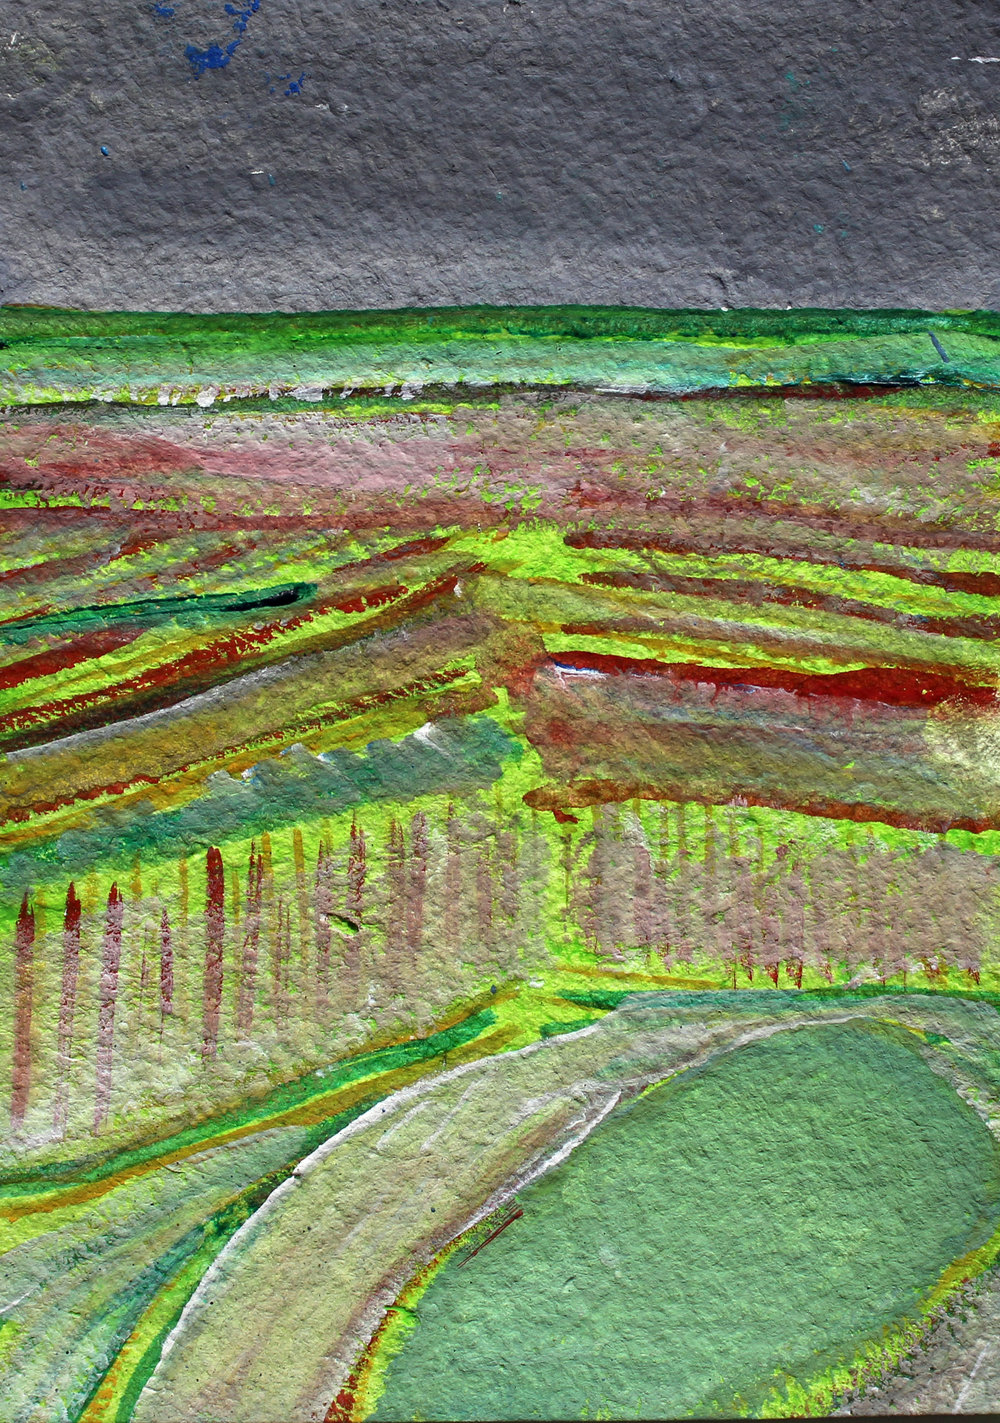 mined green drawing.jpg